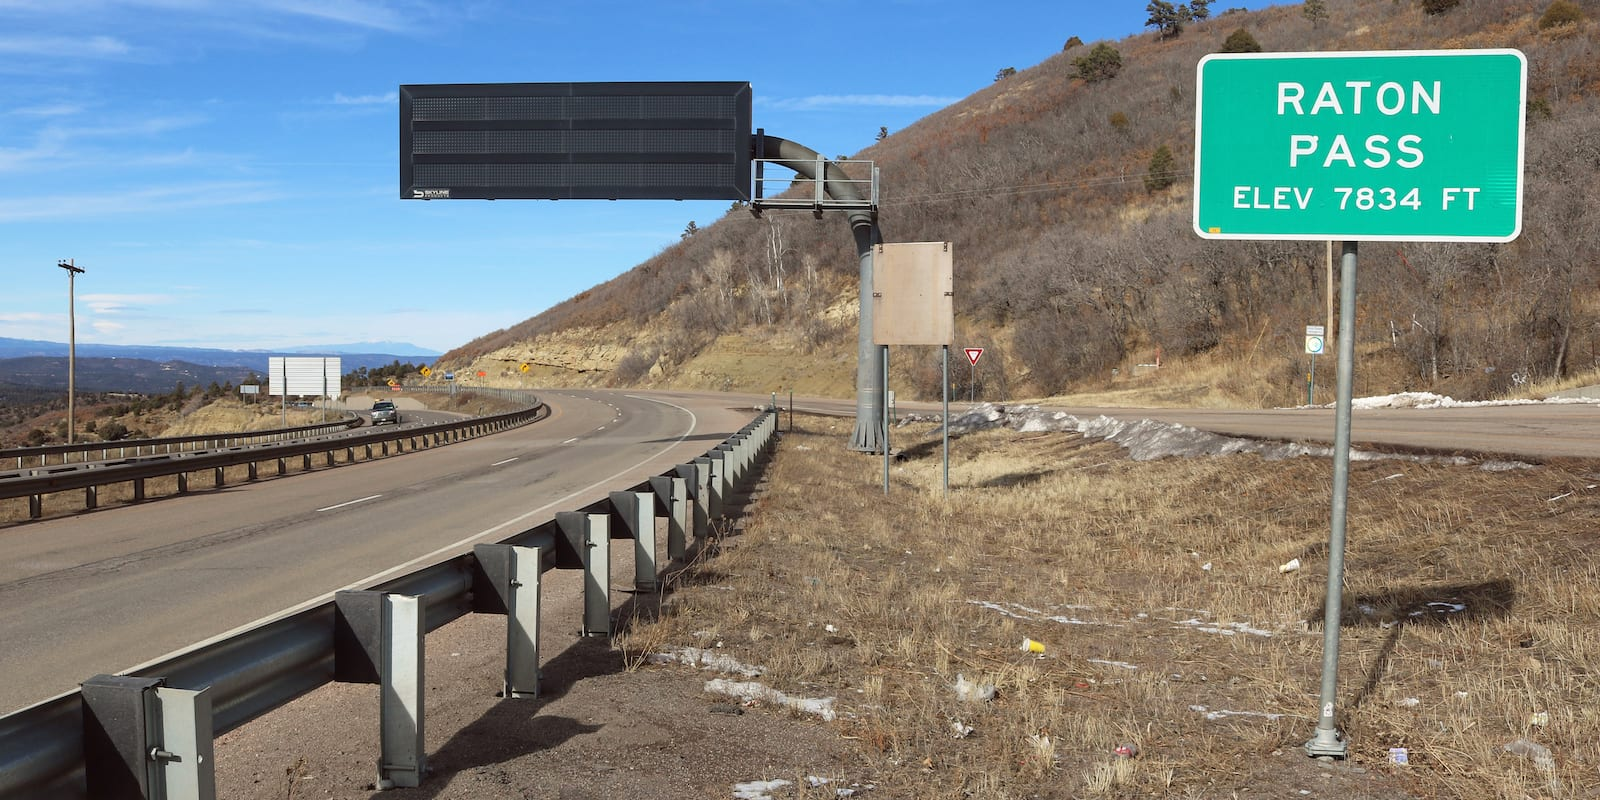 Raton Pass Colorado Summit I-25